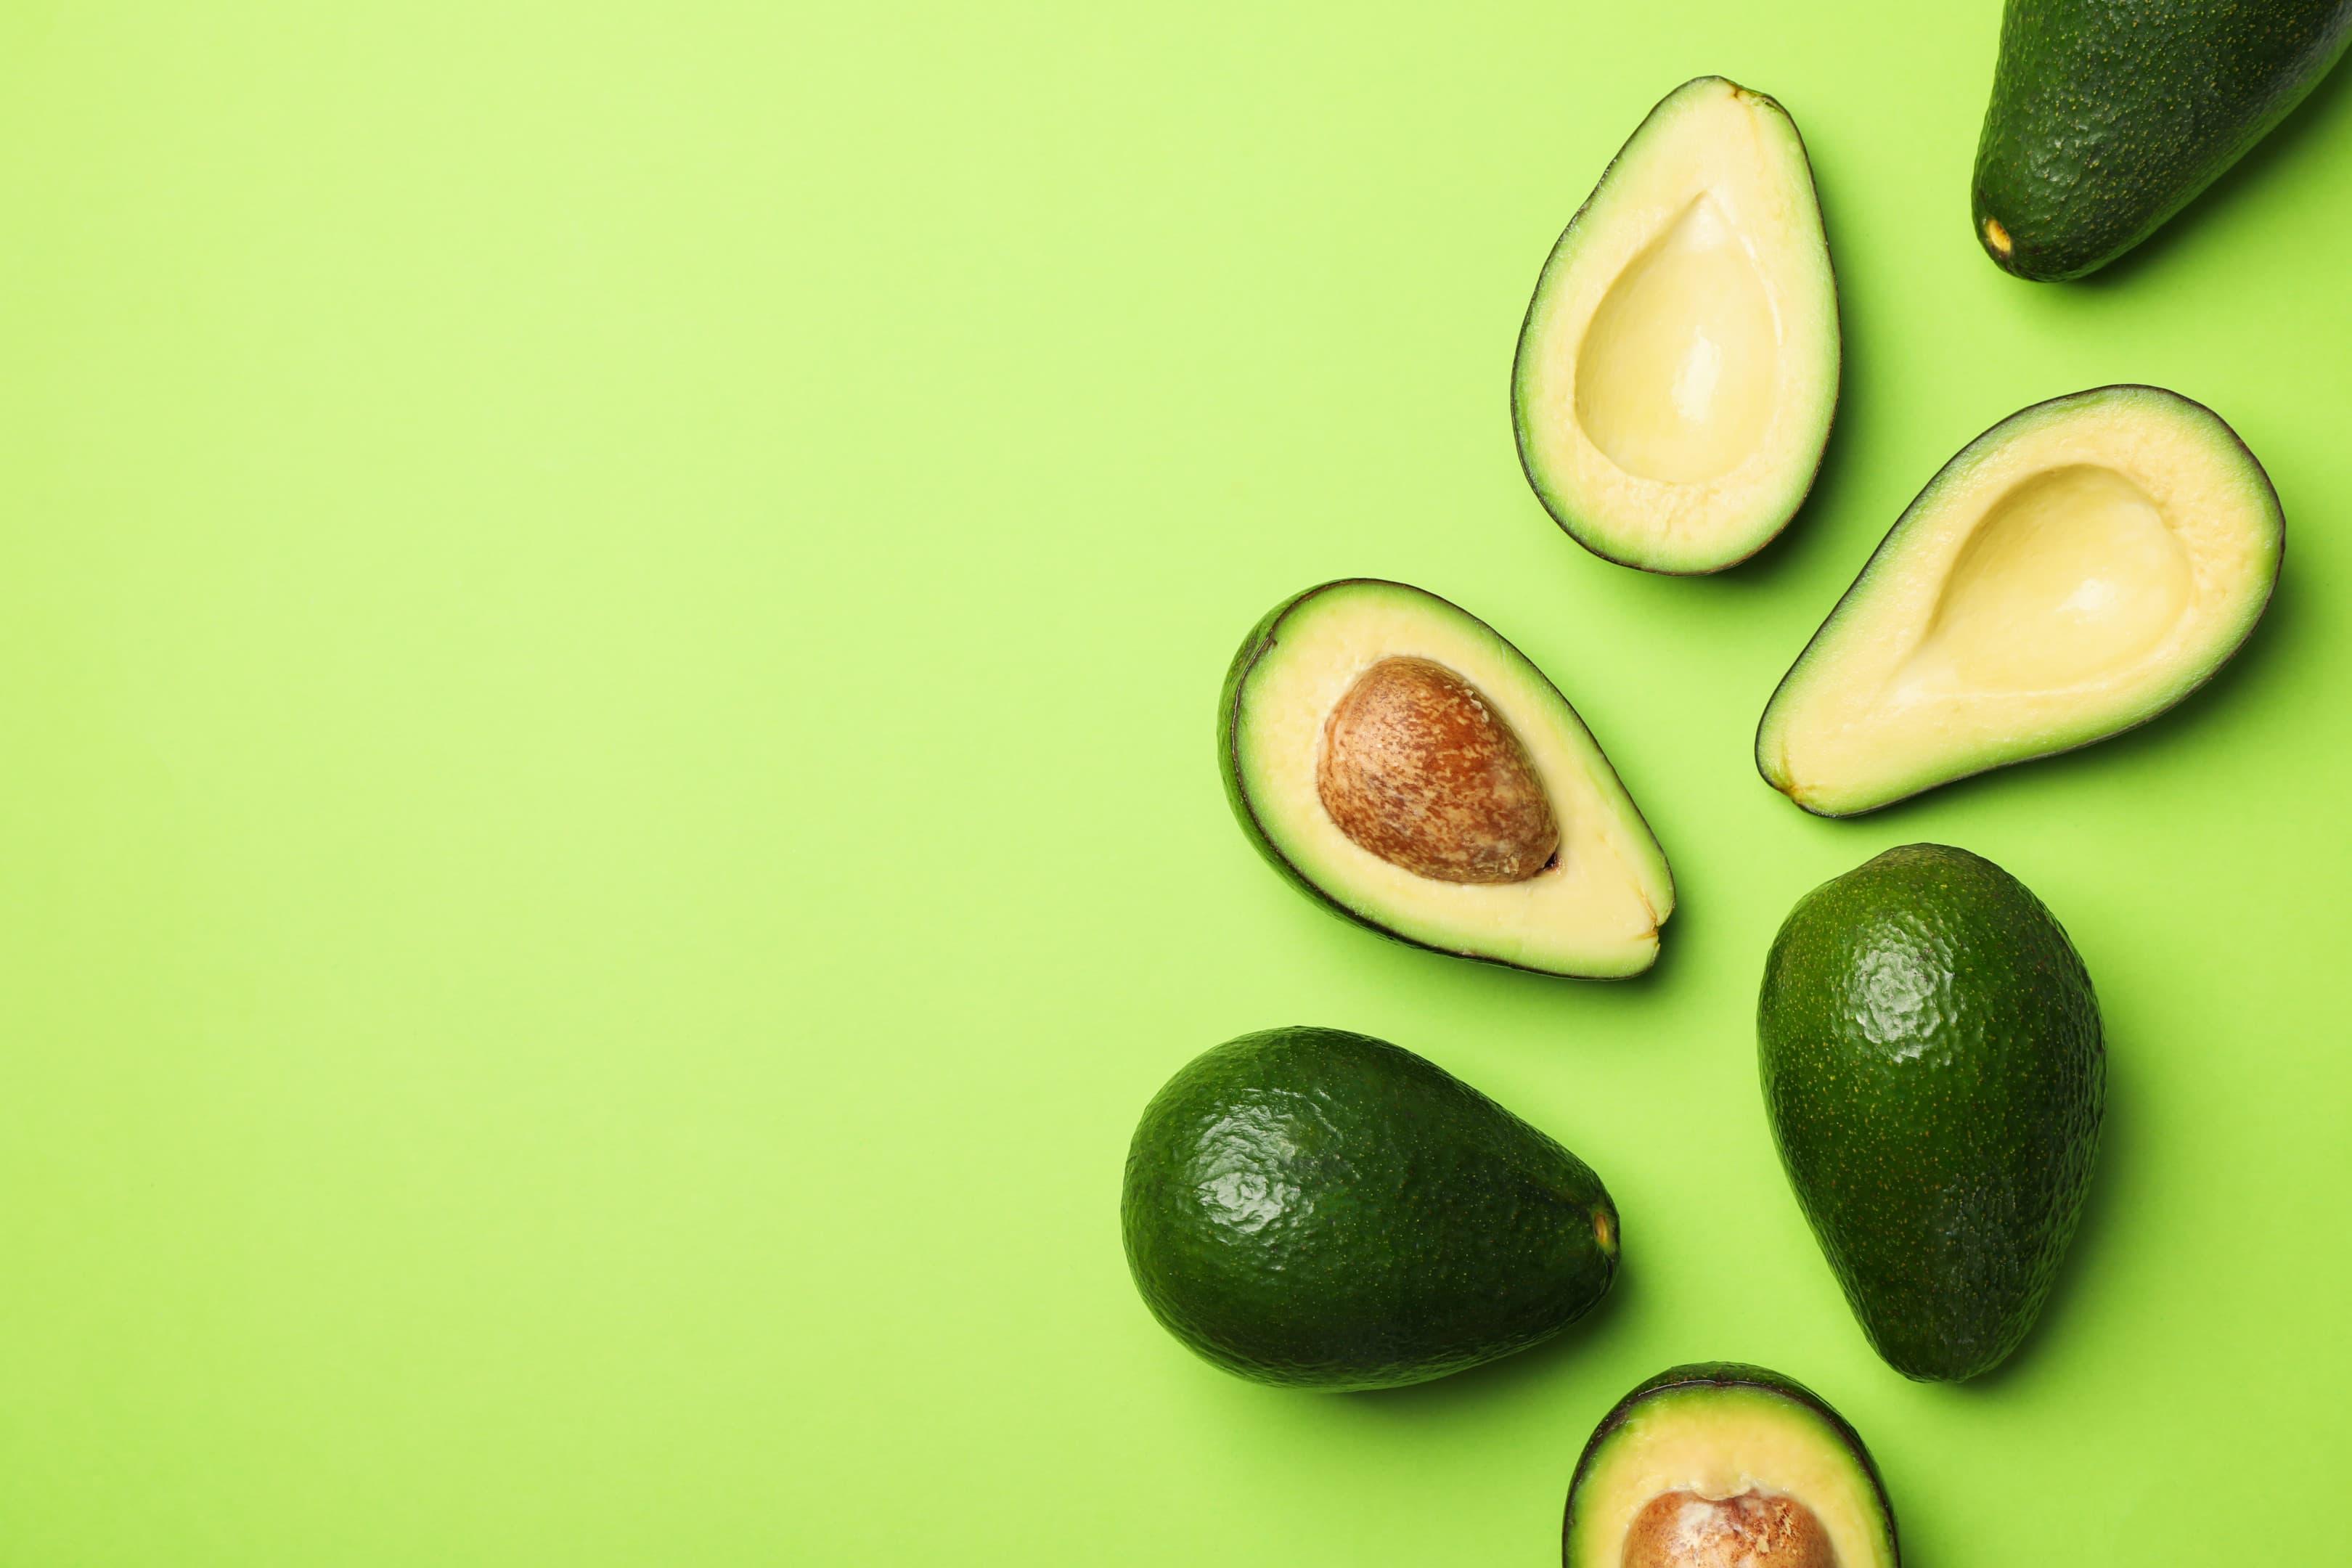 Ripe fresh avocado on green background